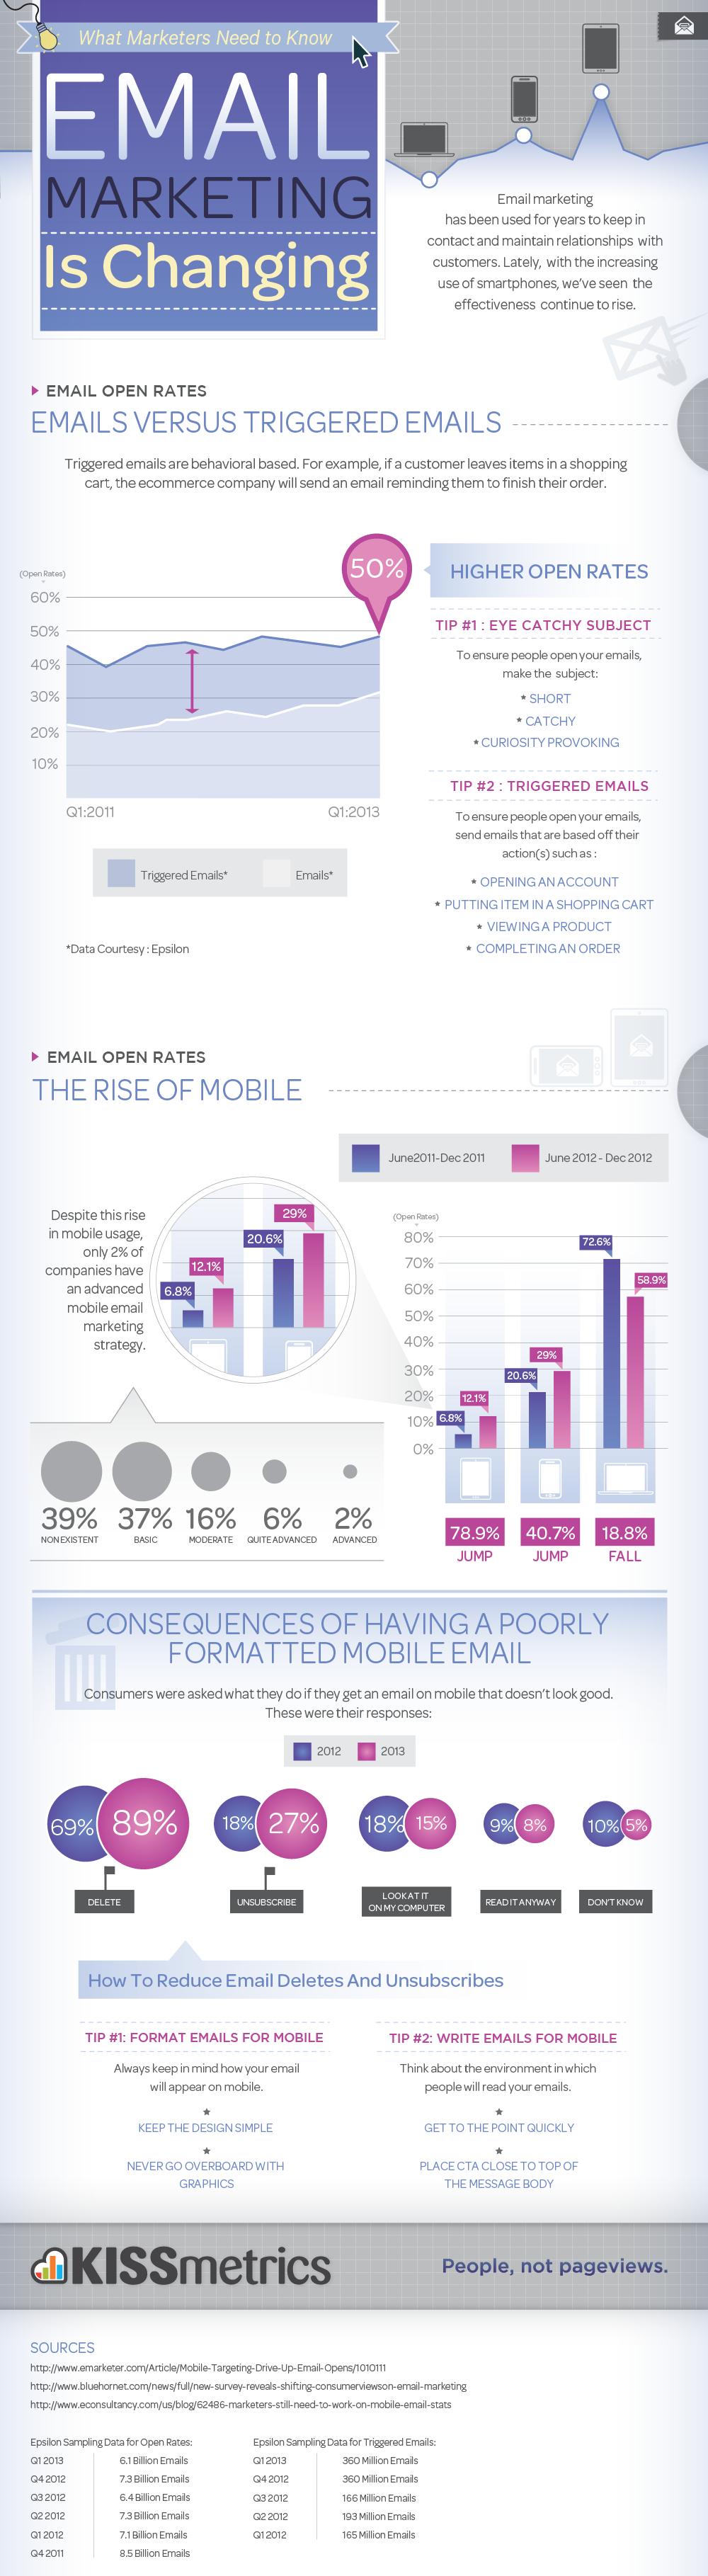 Email-Marketing-is-Changing KISSmetrics